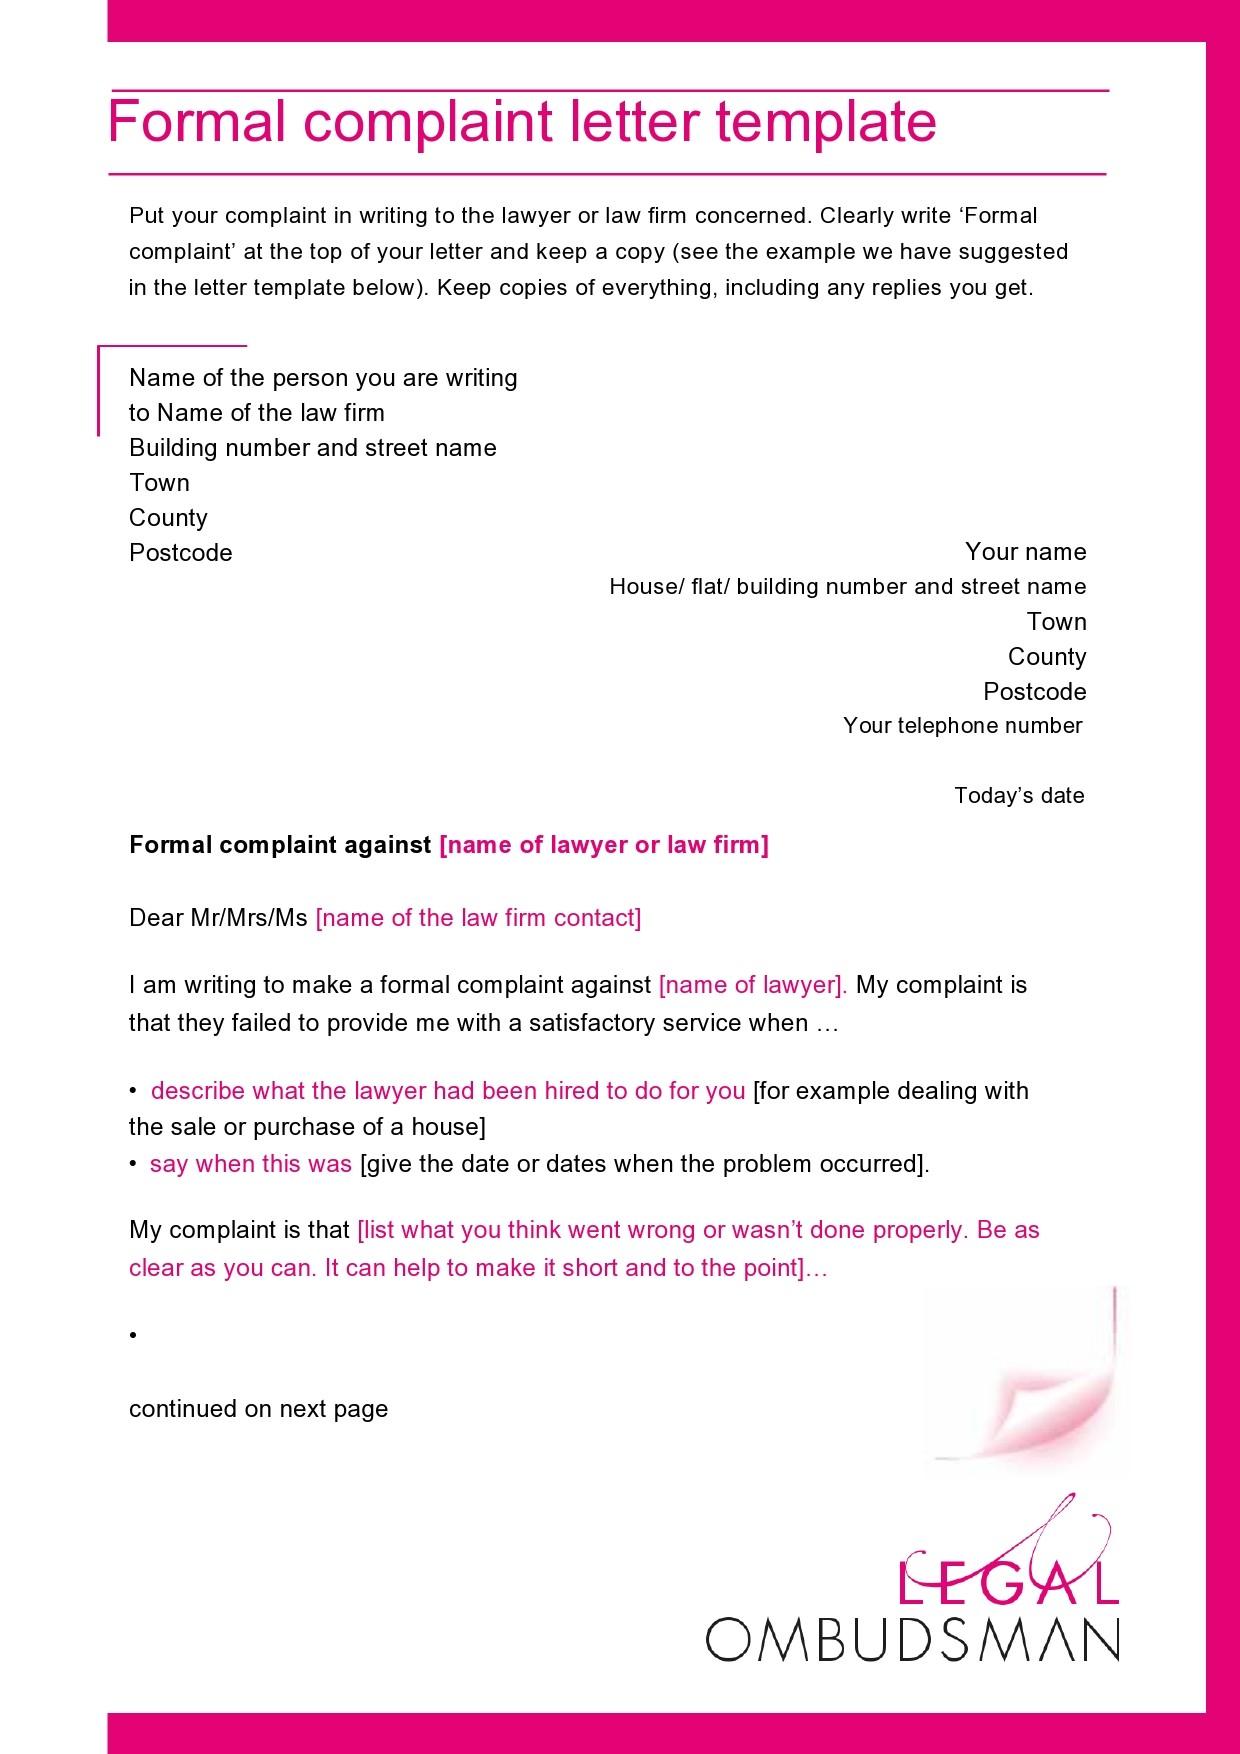 Free legal letter format 06